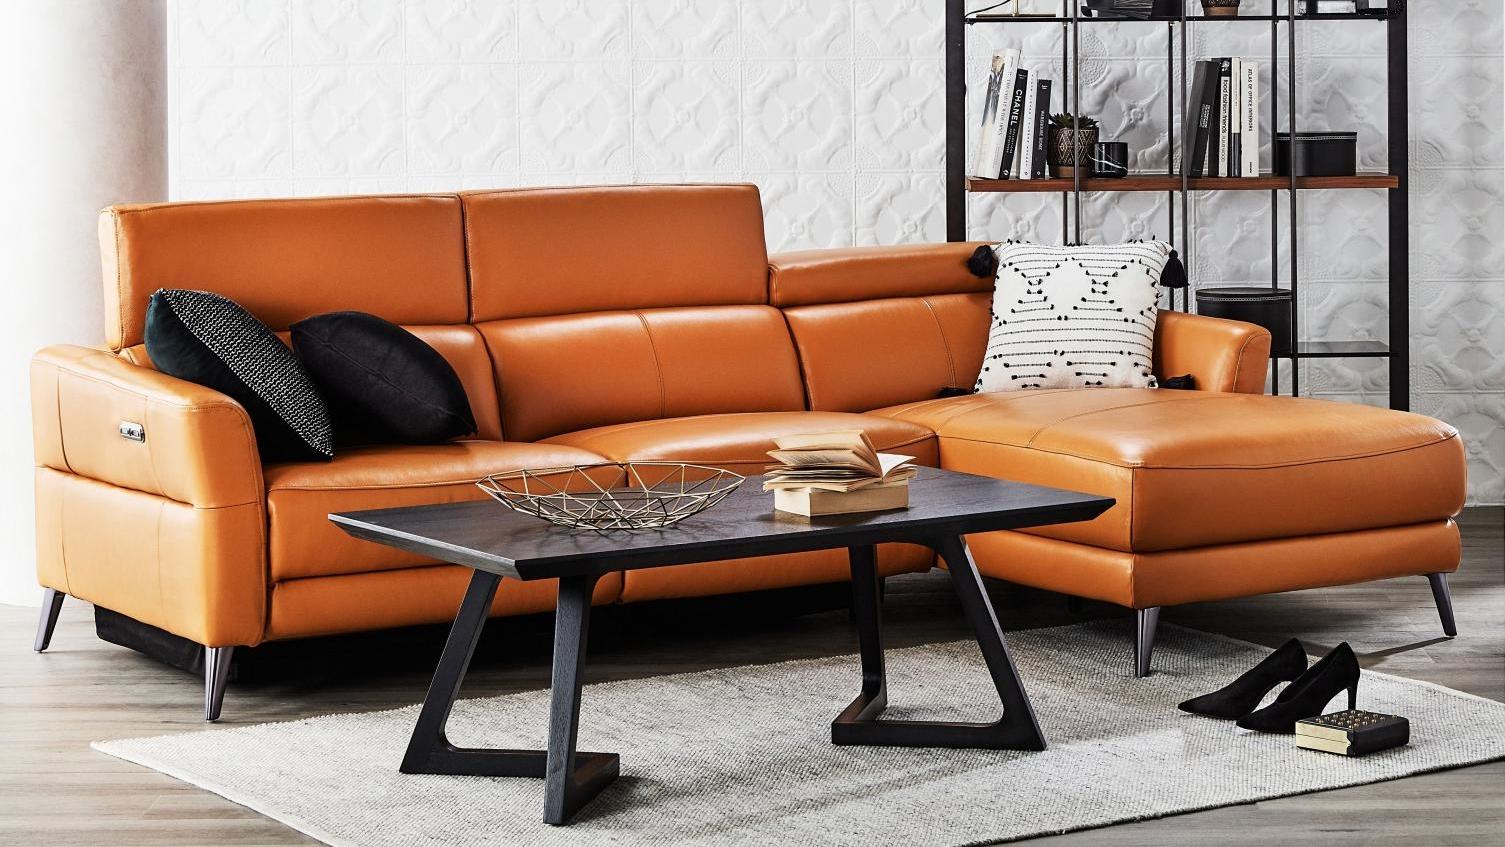 buy kiowa coffee table domayne au rh domayne com au